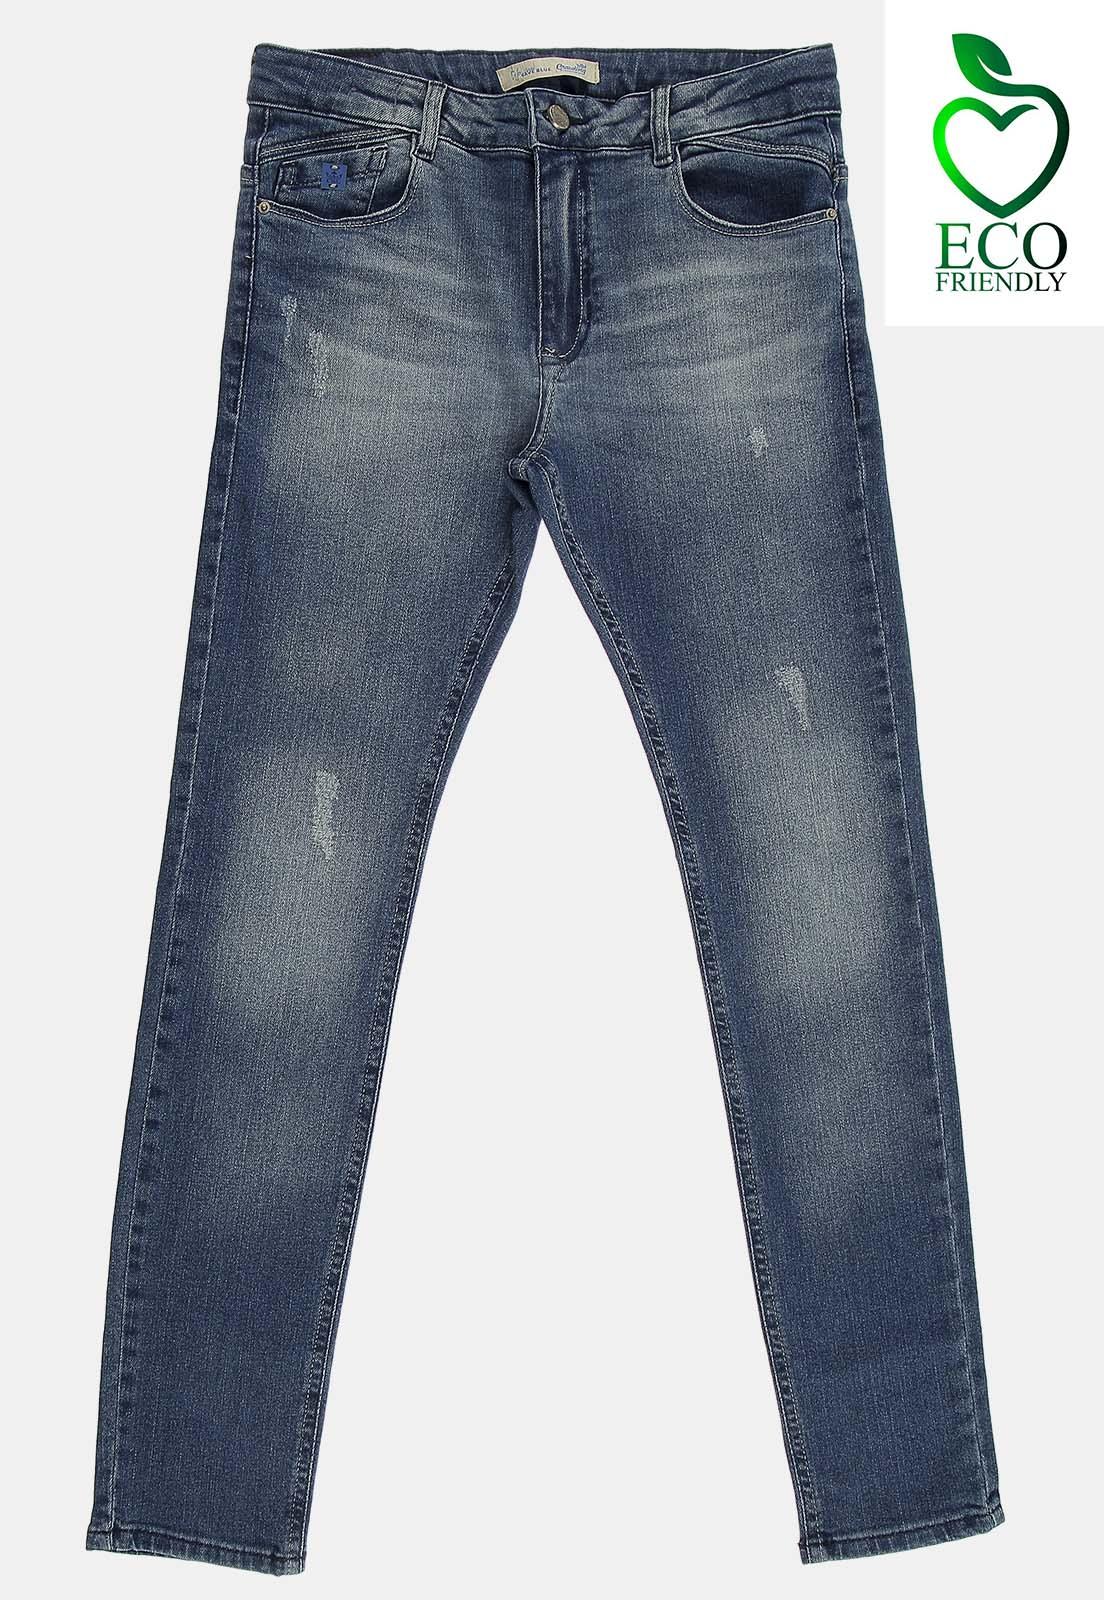 Calça Crawling Jeans Masculina Skinny Eco Dye